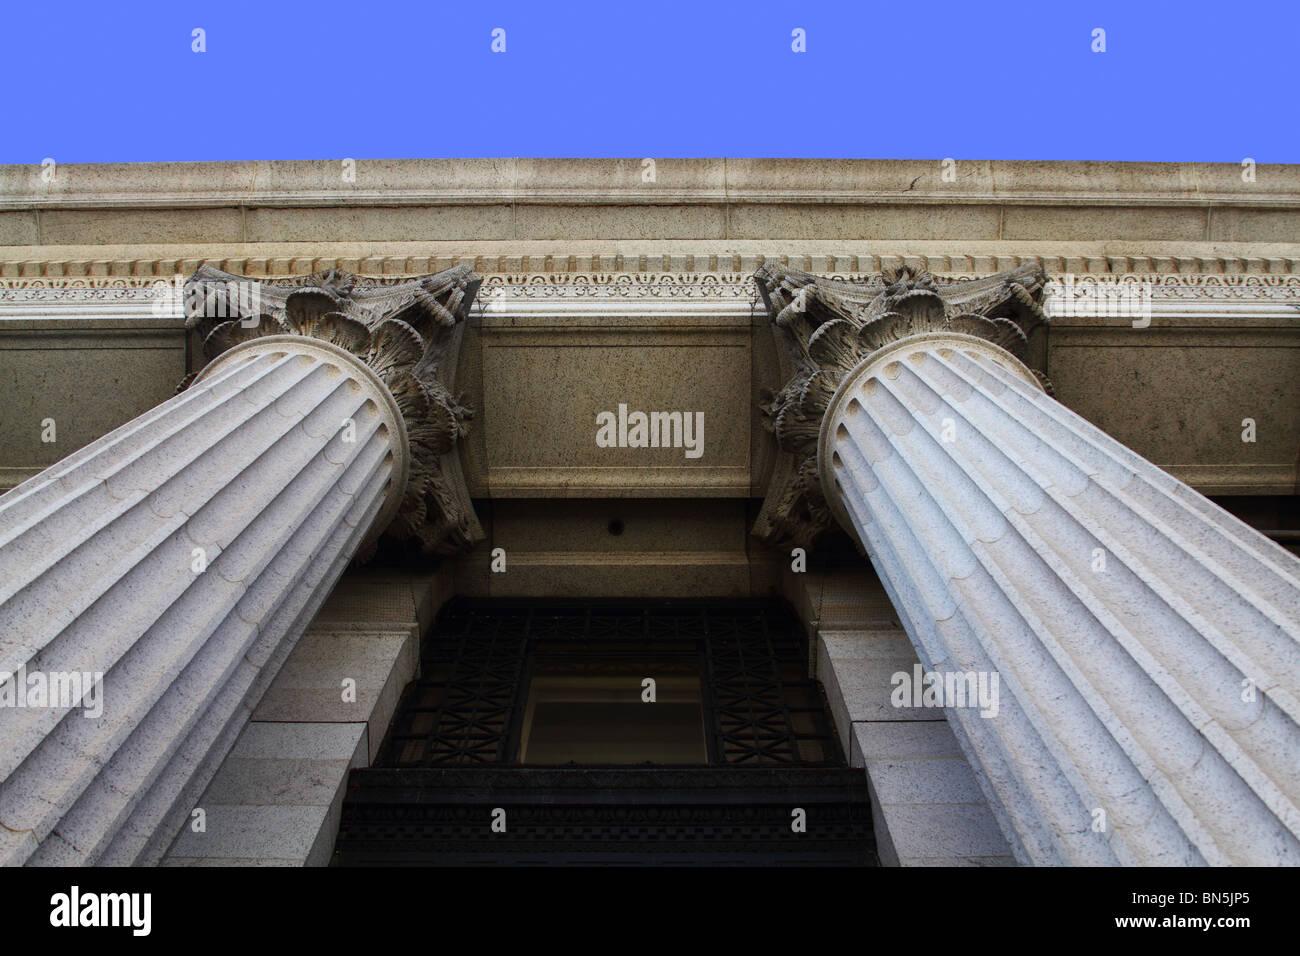 Two large Corinthian columns. - Stock Image